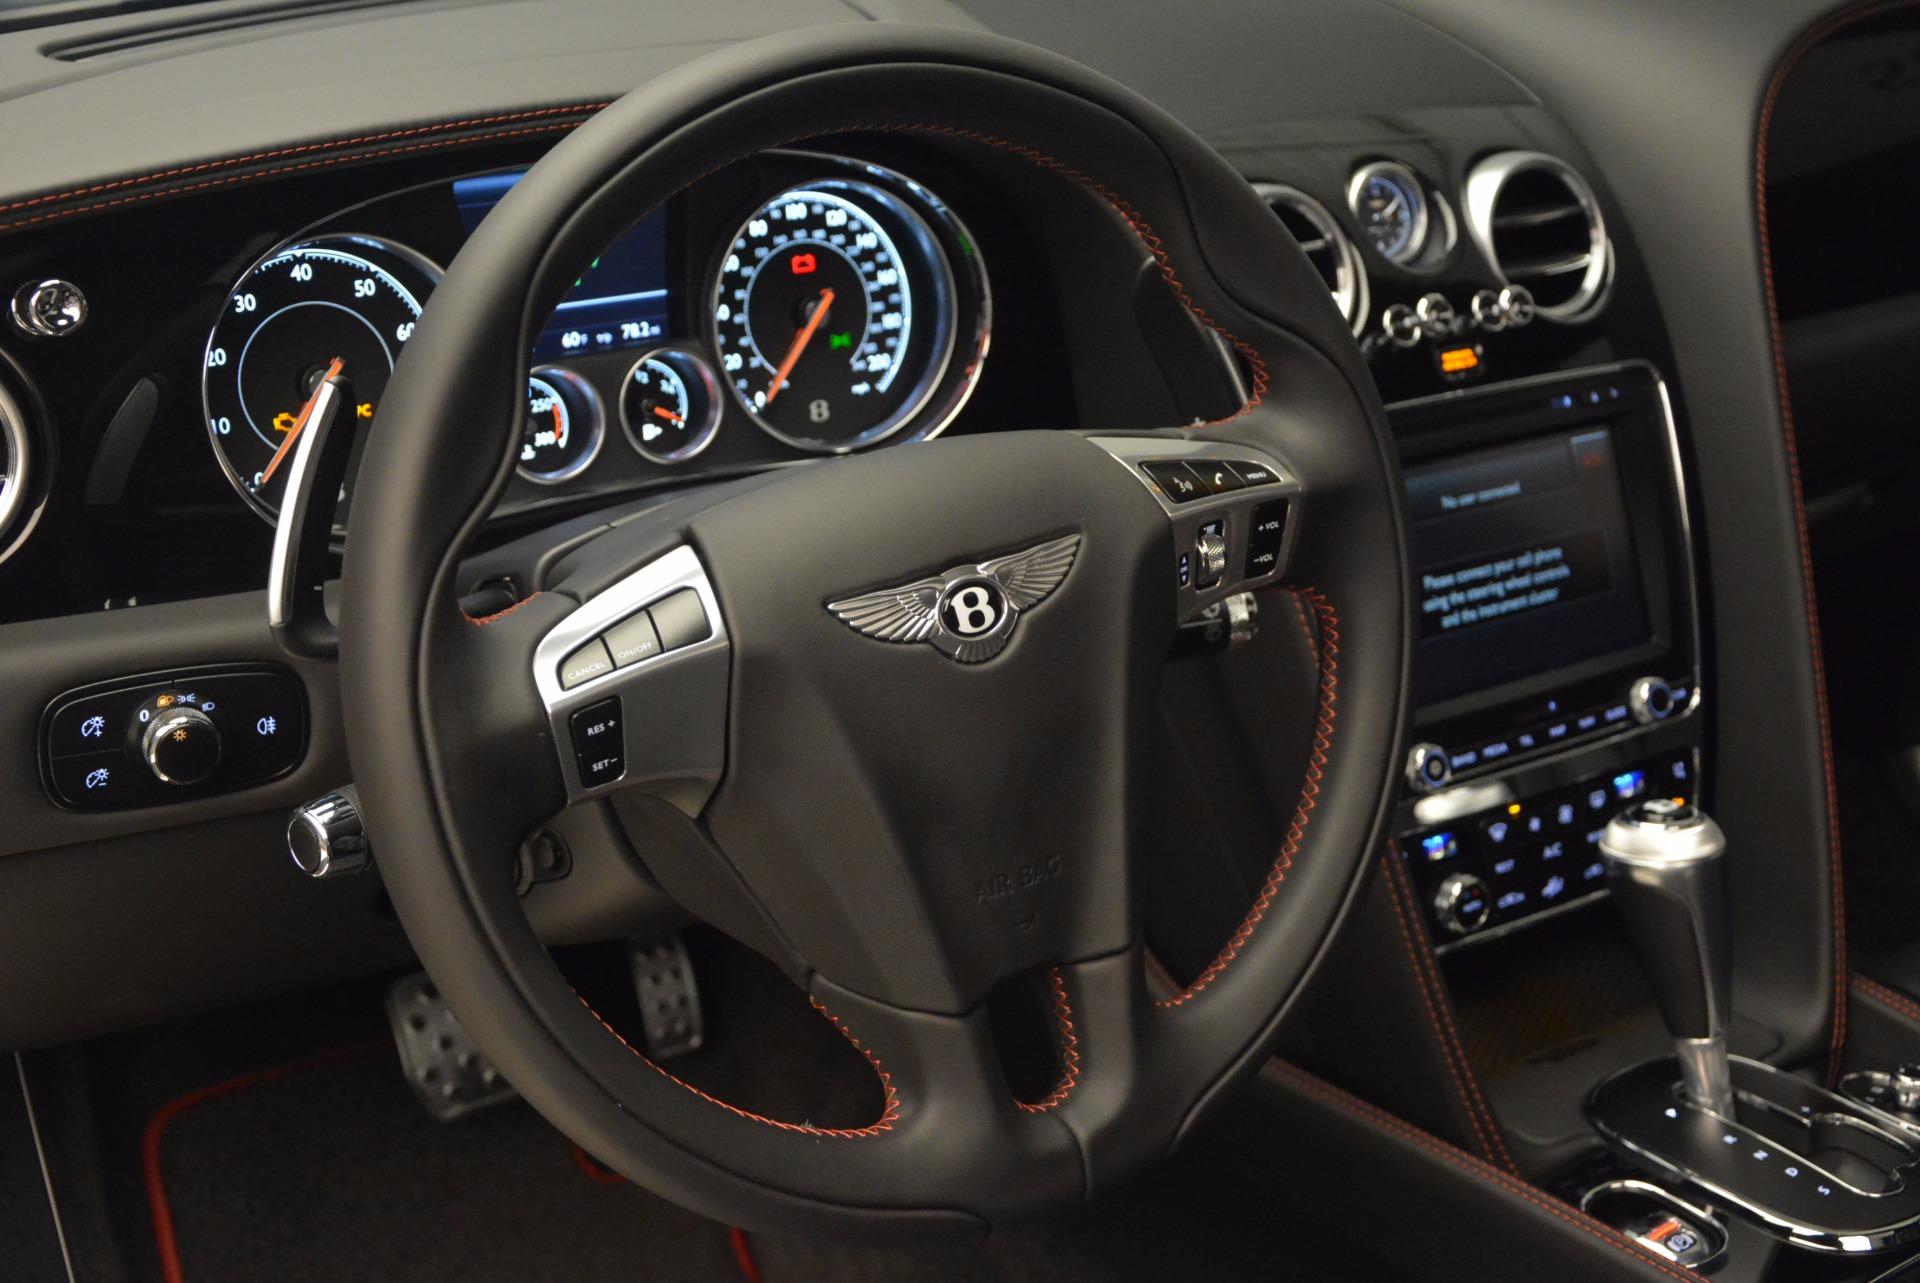 Used 2017 Bentley Flying Spur V8 S For Sale In Westport, CT 732_p31